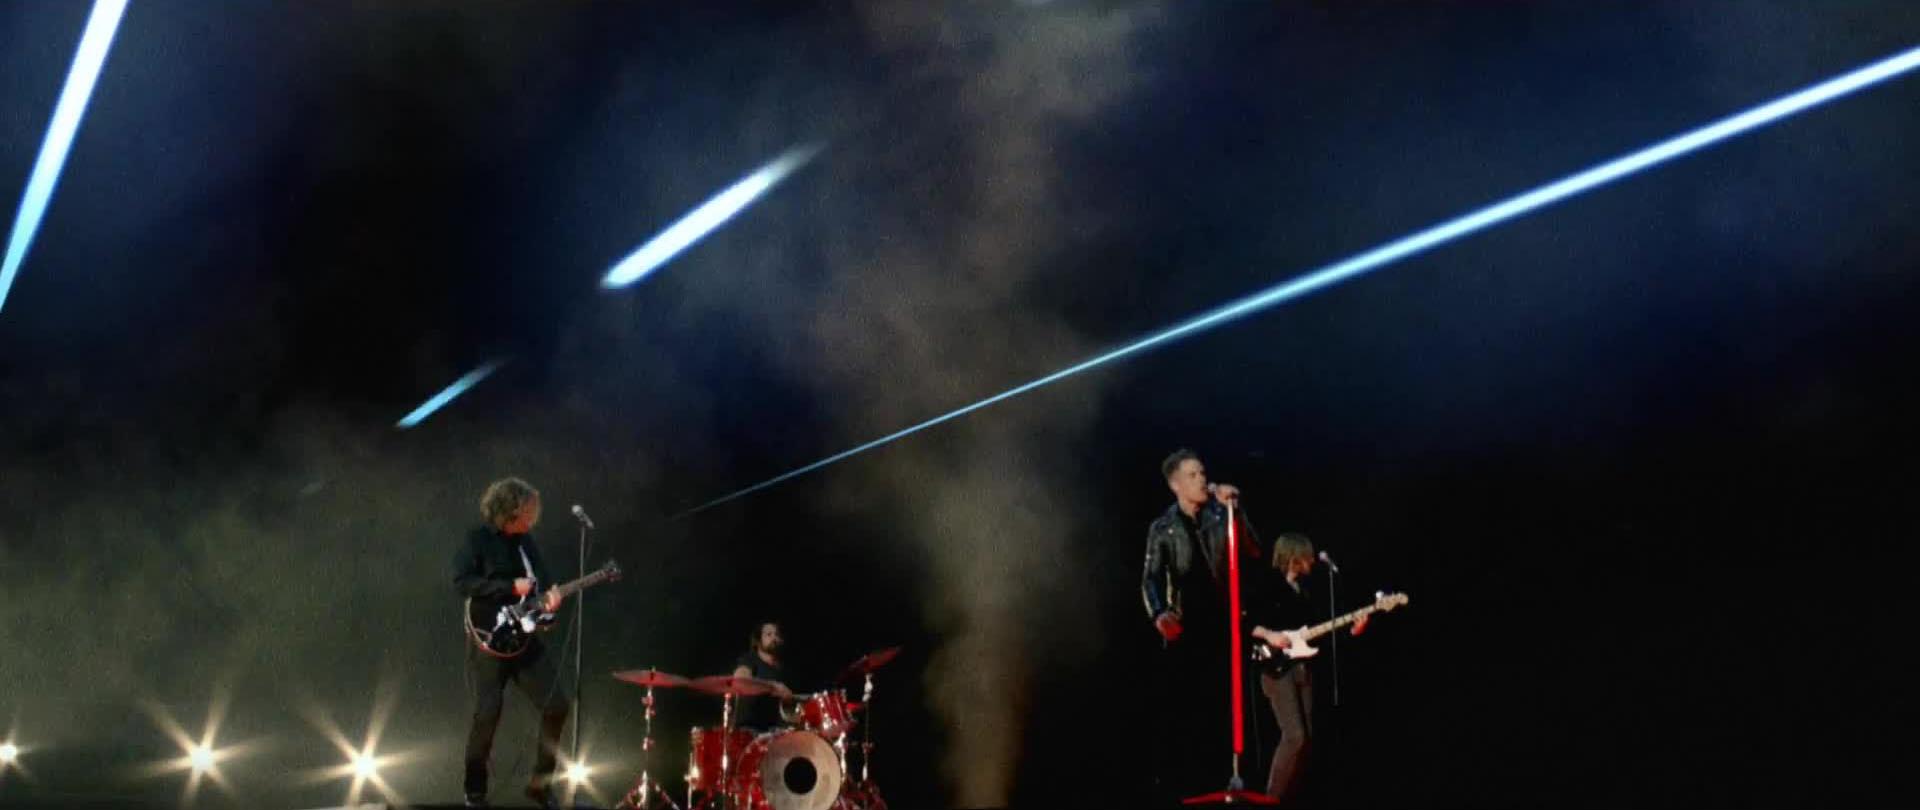 Il video ufficiale di Runaways